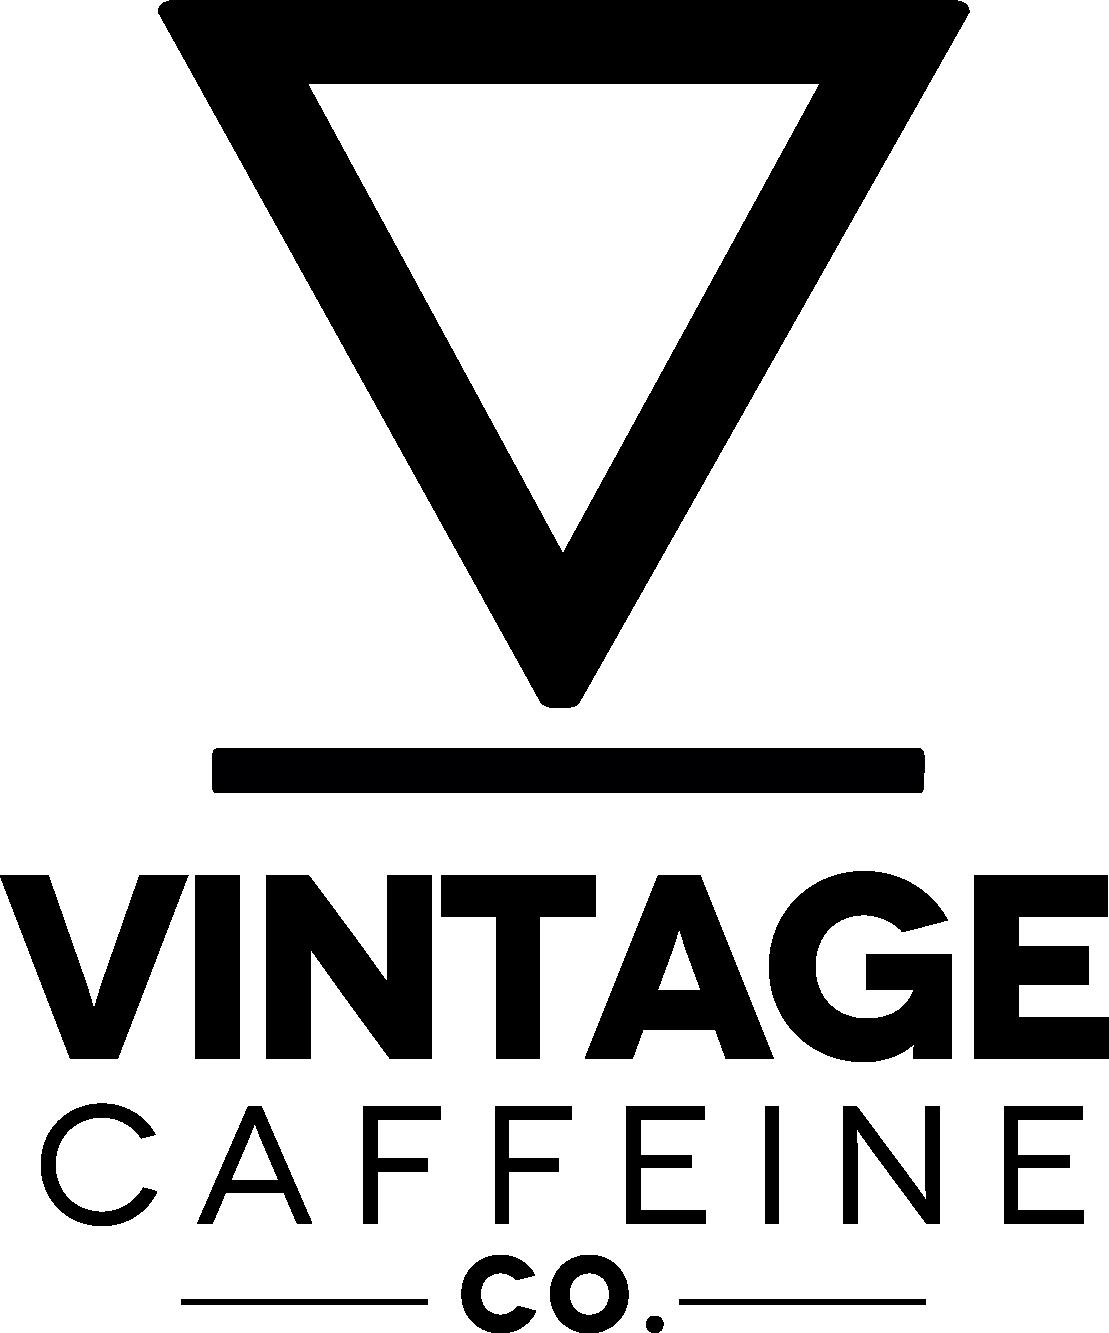 Vintage Caffeine Co. - KensingtonFebruary 1 - 28, 2019